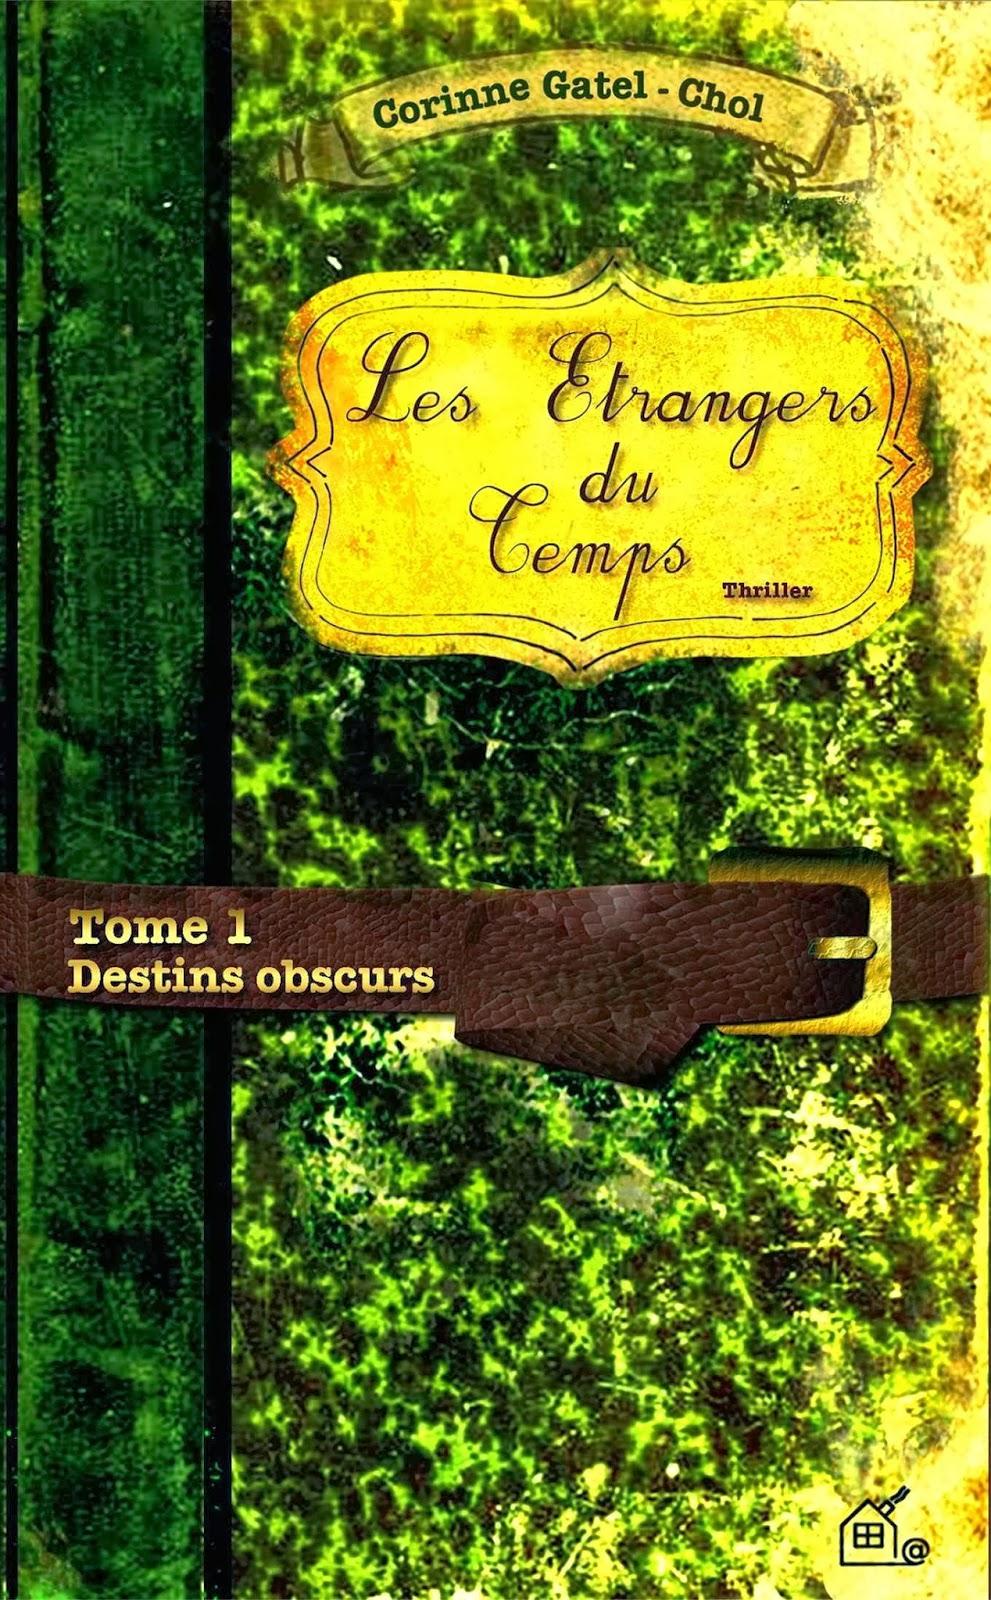 http://bouquinsenfolie.blogspot.com/2014/01/quand-jai-17-ans.html